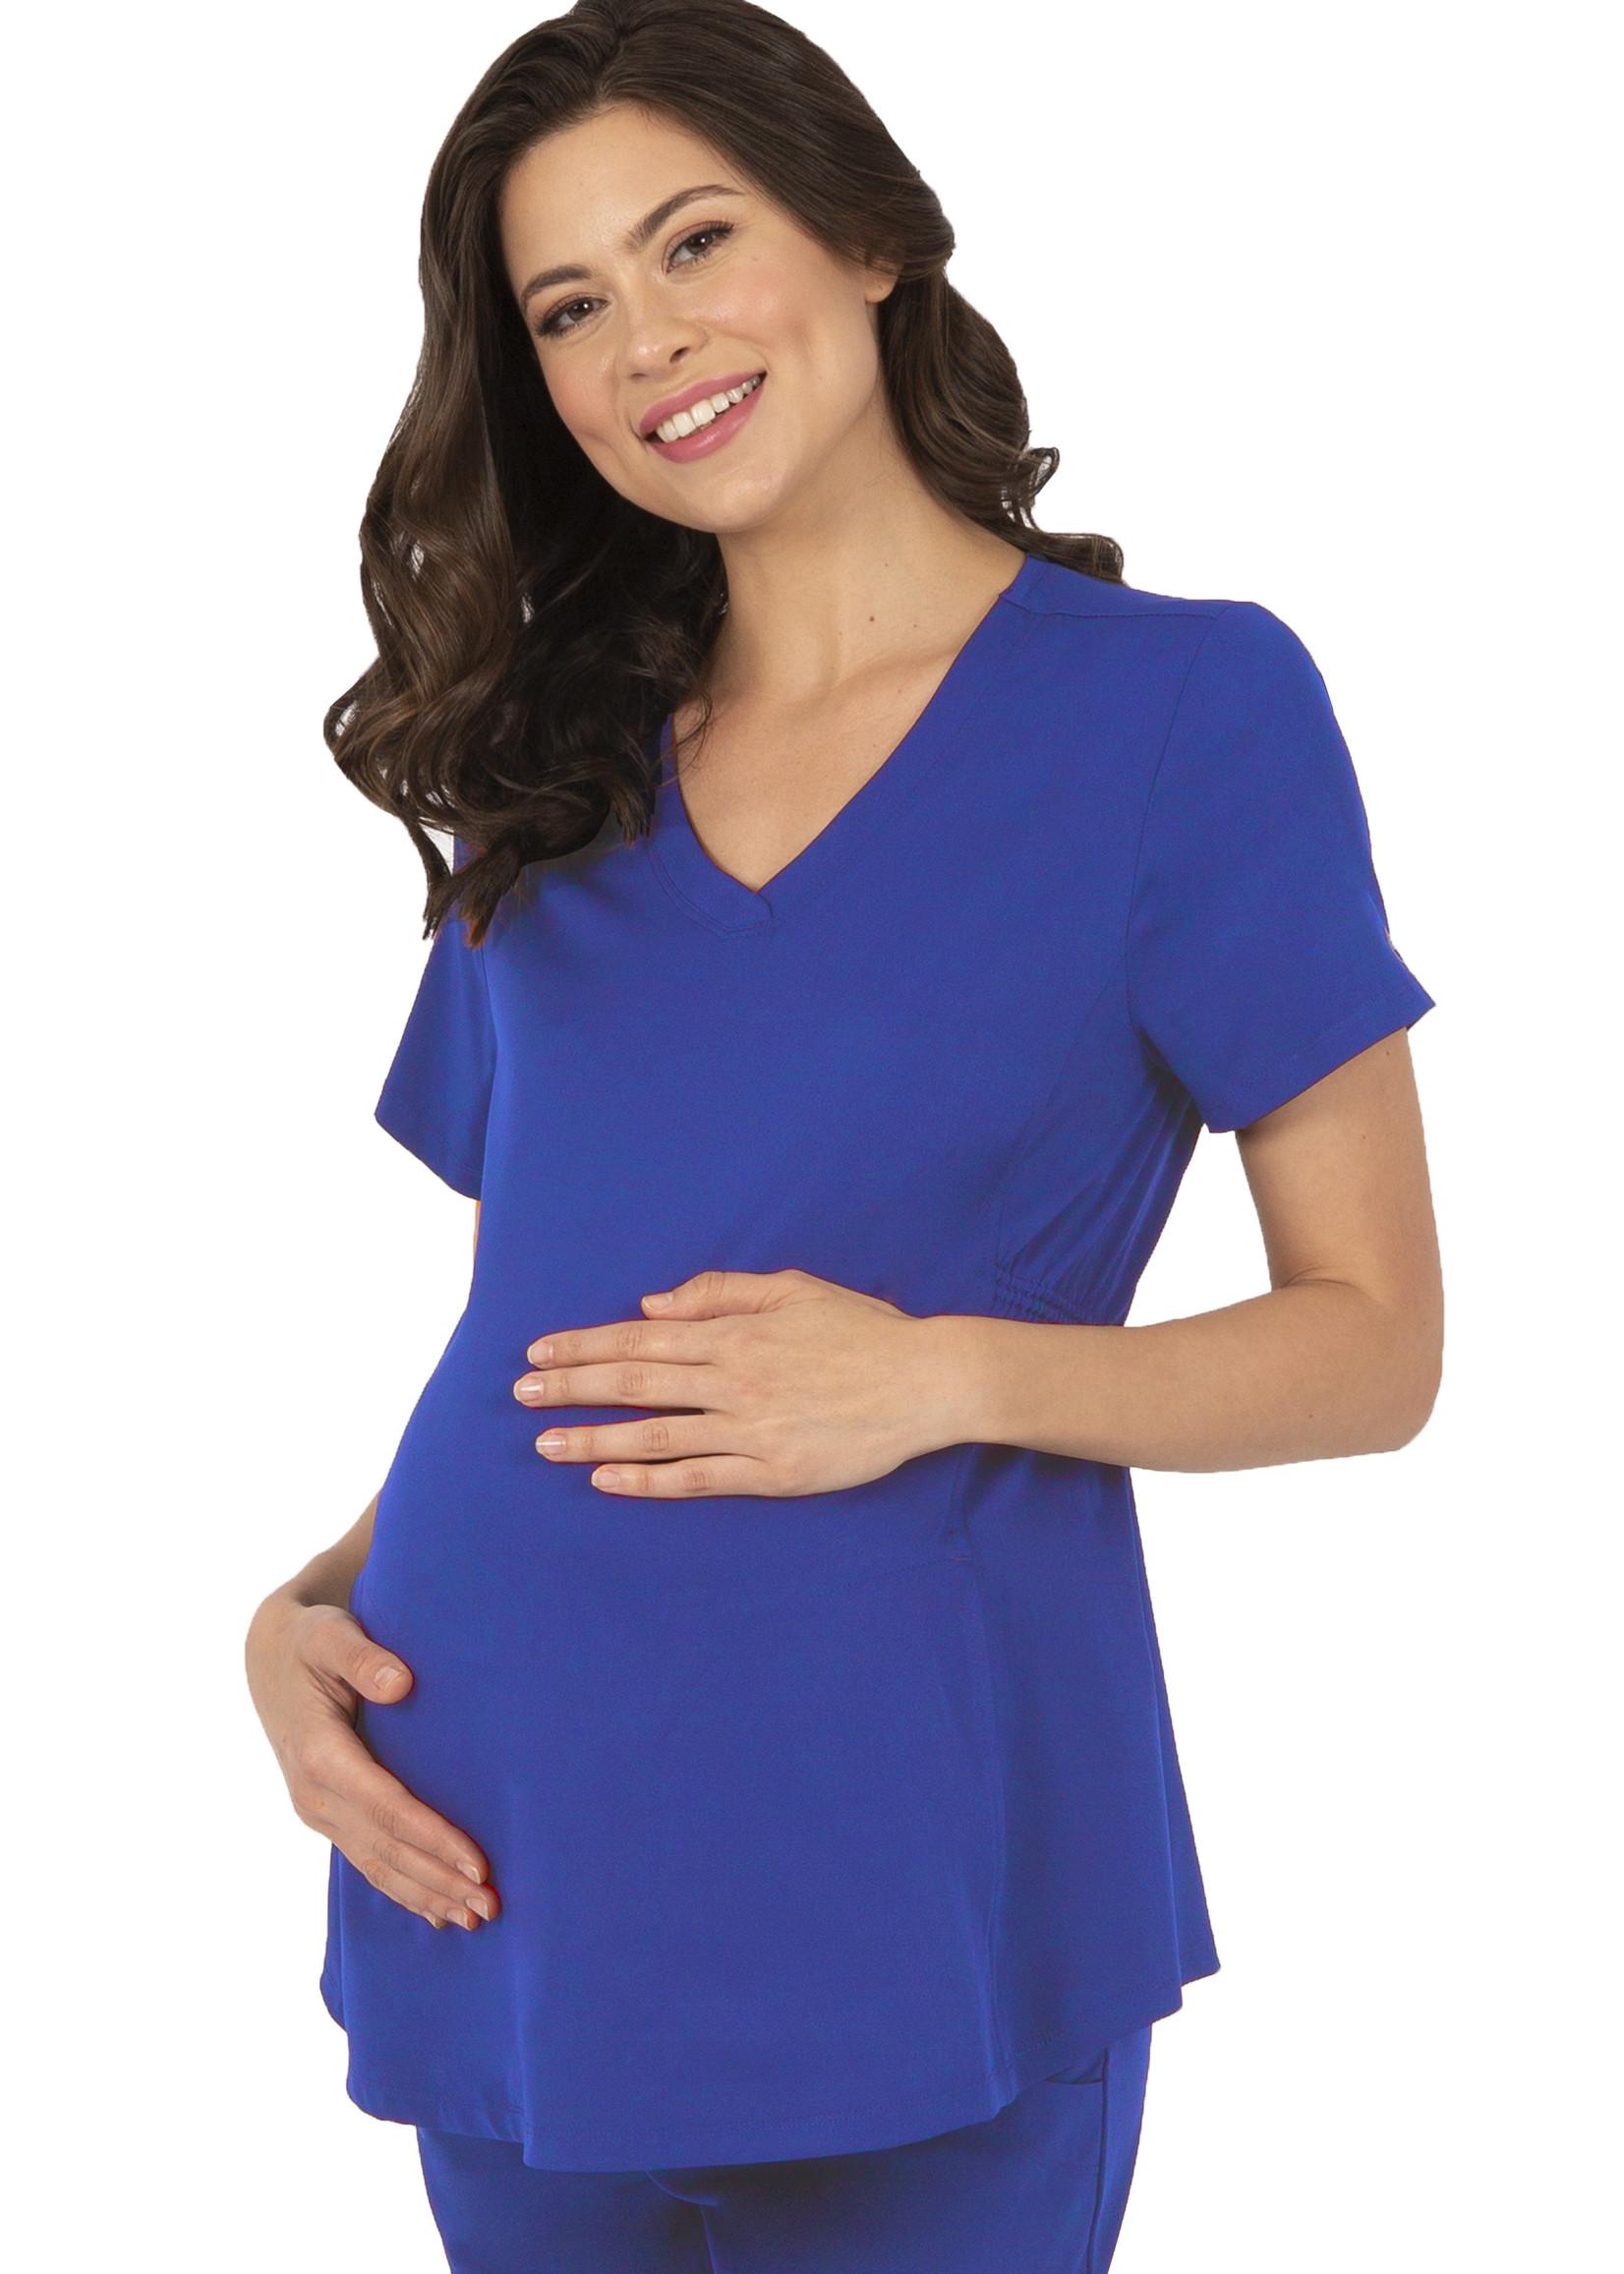 Healing Hands HH2510 Mila Maternity Top